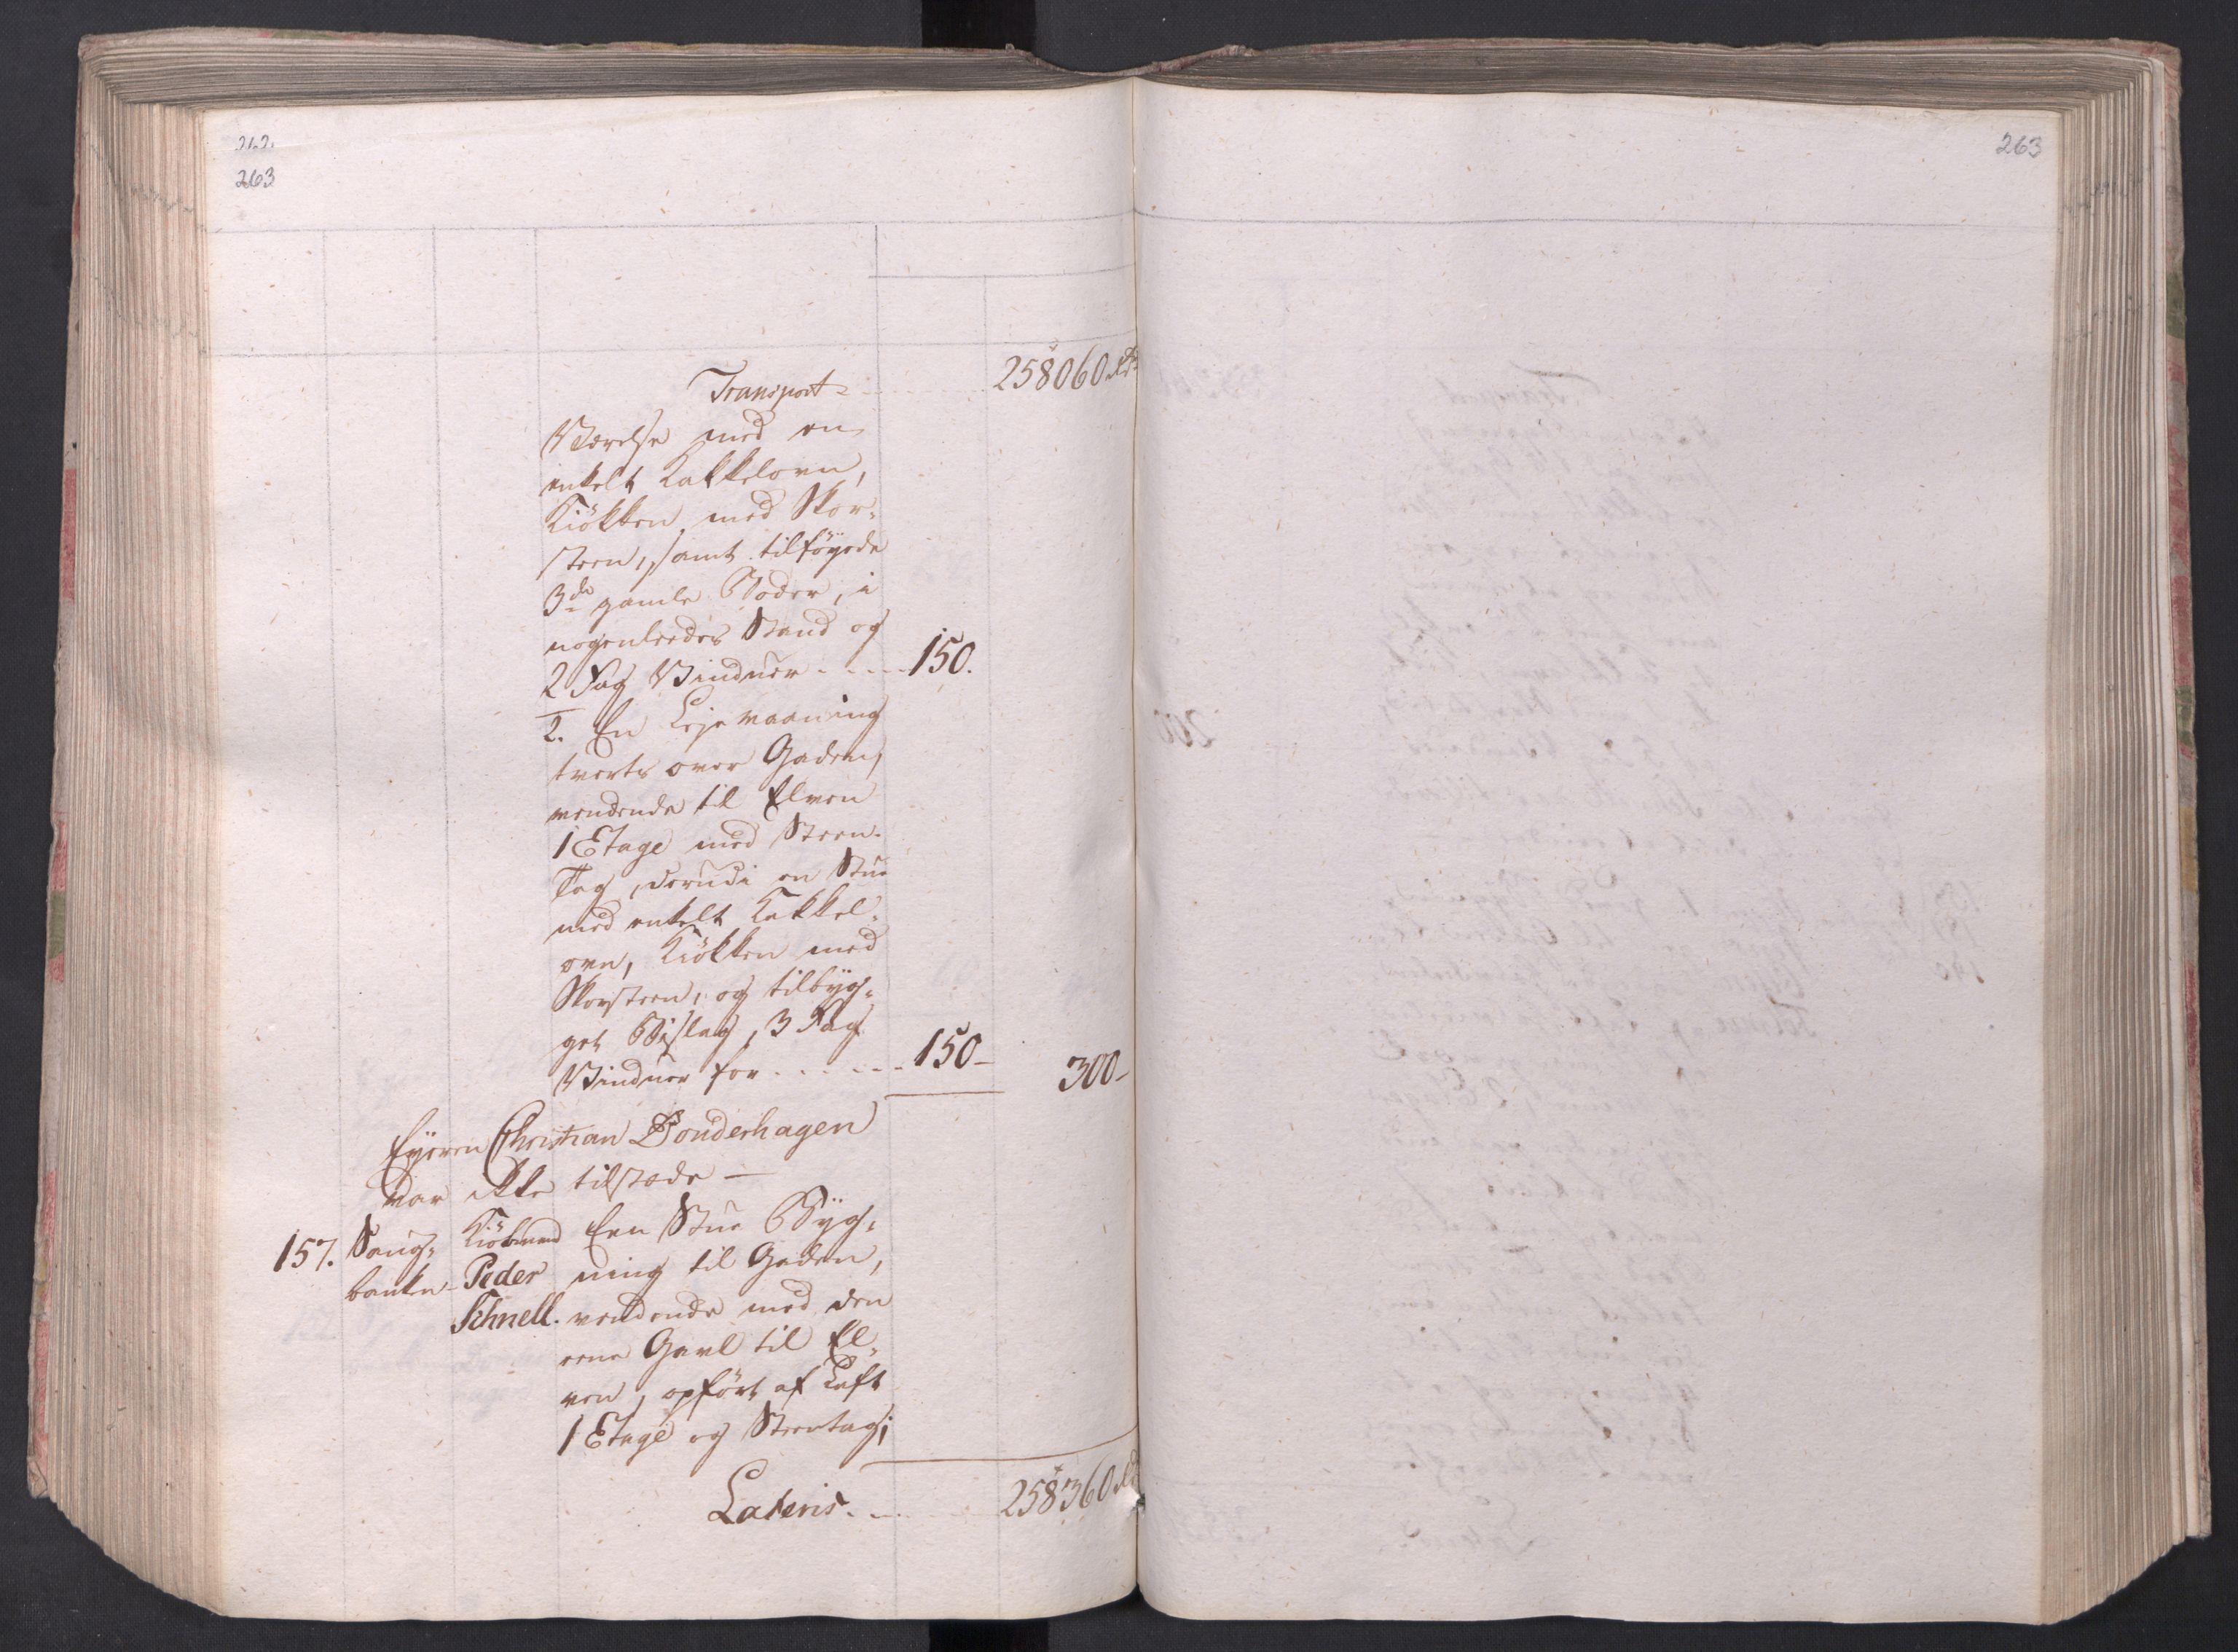 SAO, Kristiania stiftamt, I/Ia/L0015: Branntakster, 1797, s. 263